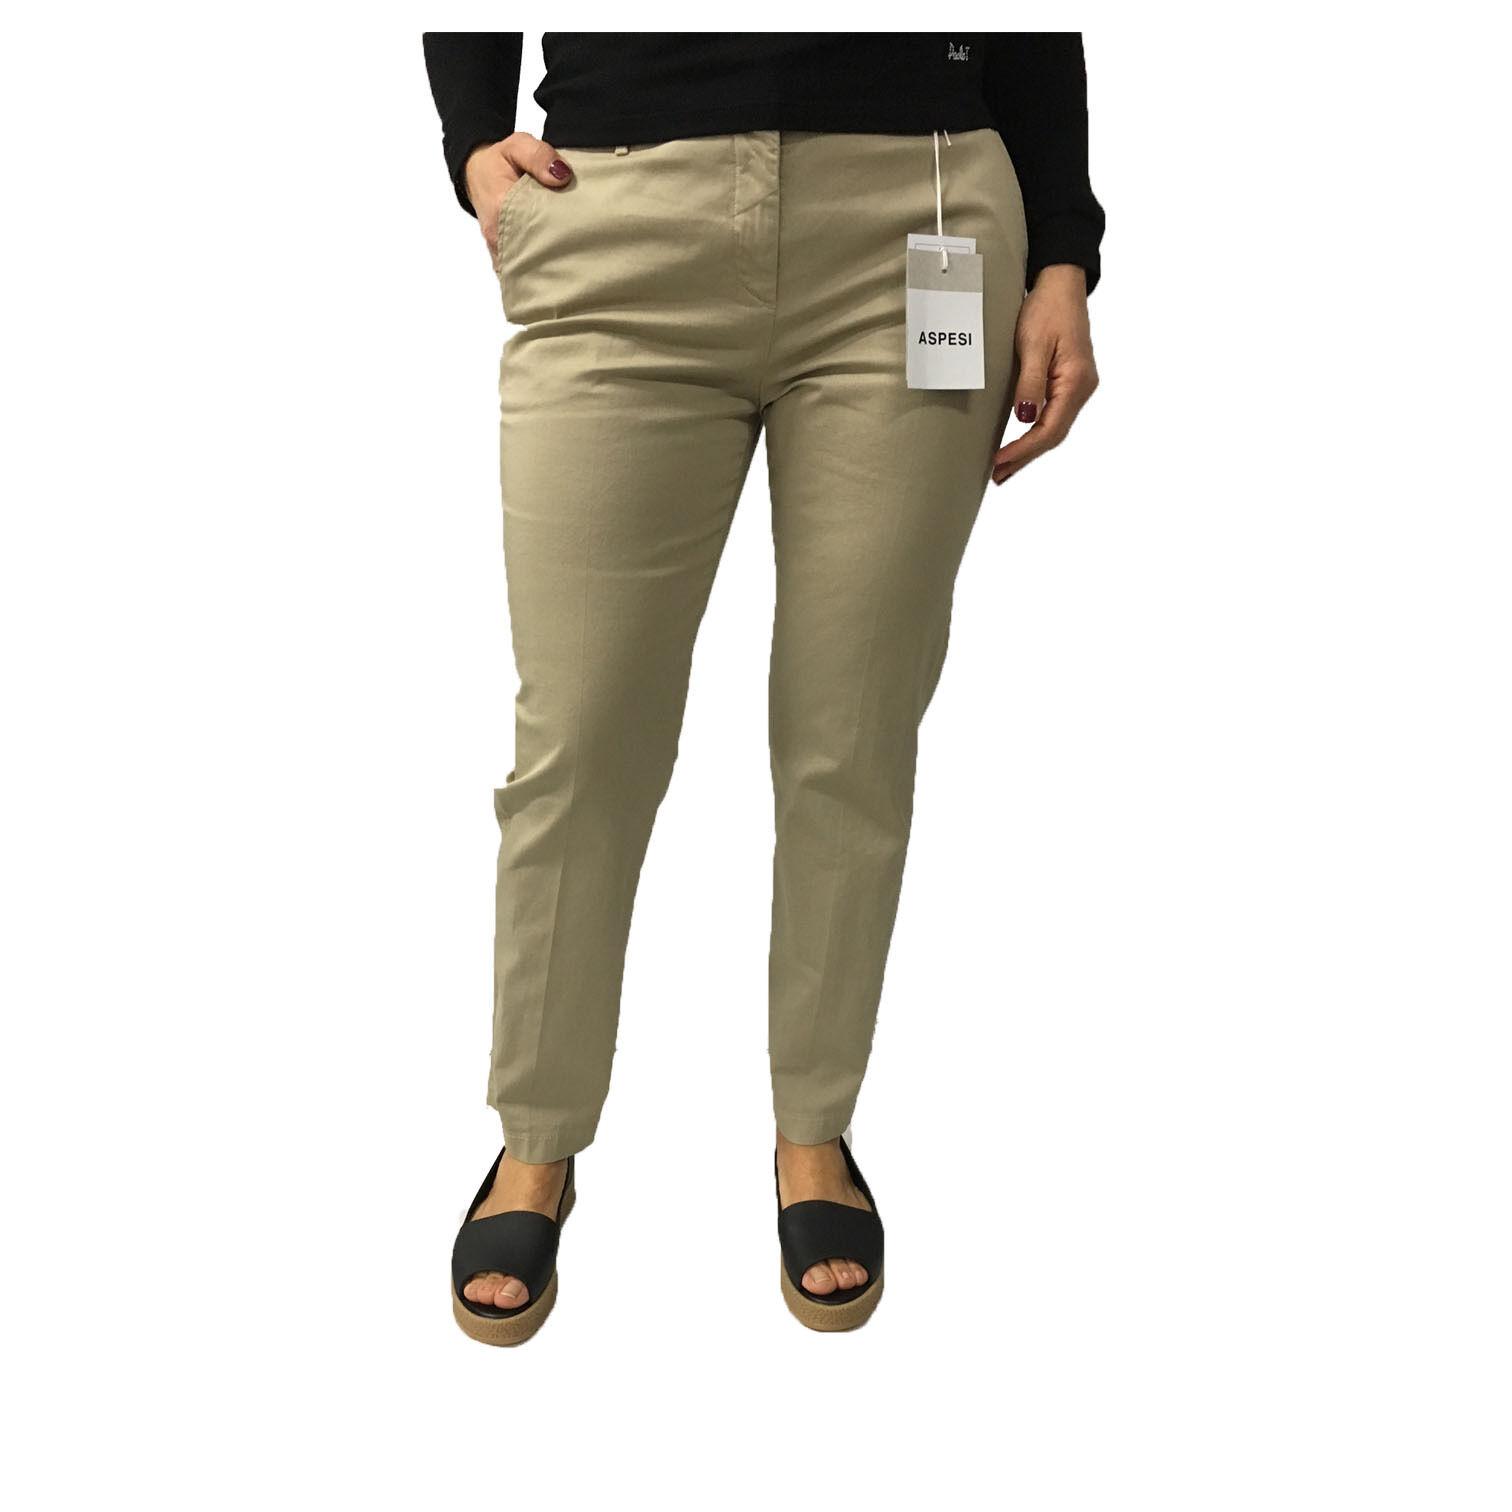 ASPESI Woman Pants Beige h105 Model 98% Cotton 2% Elastane